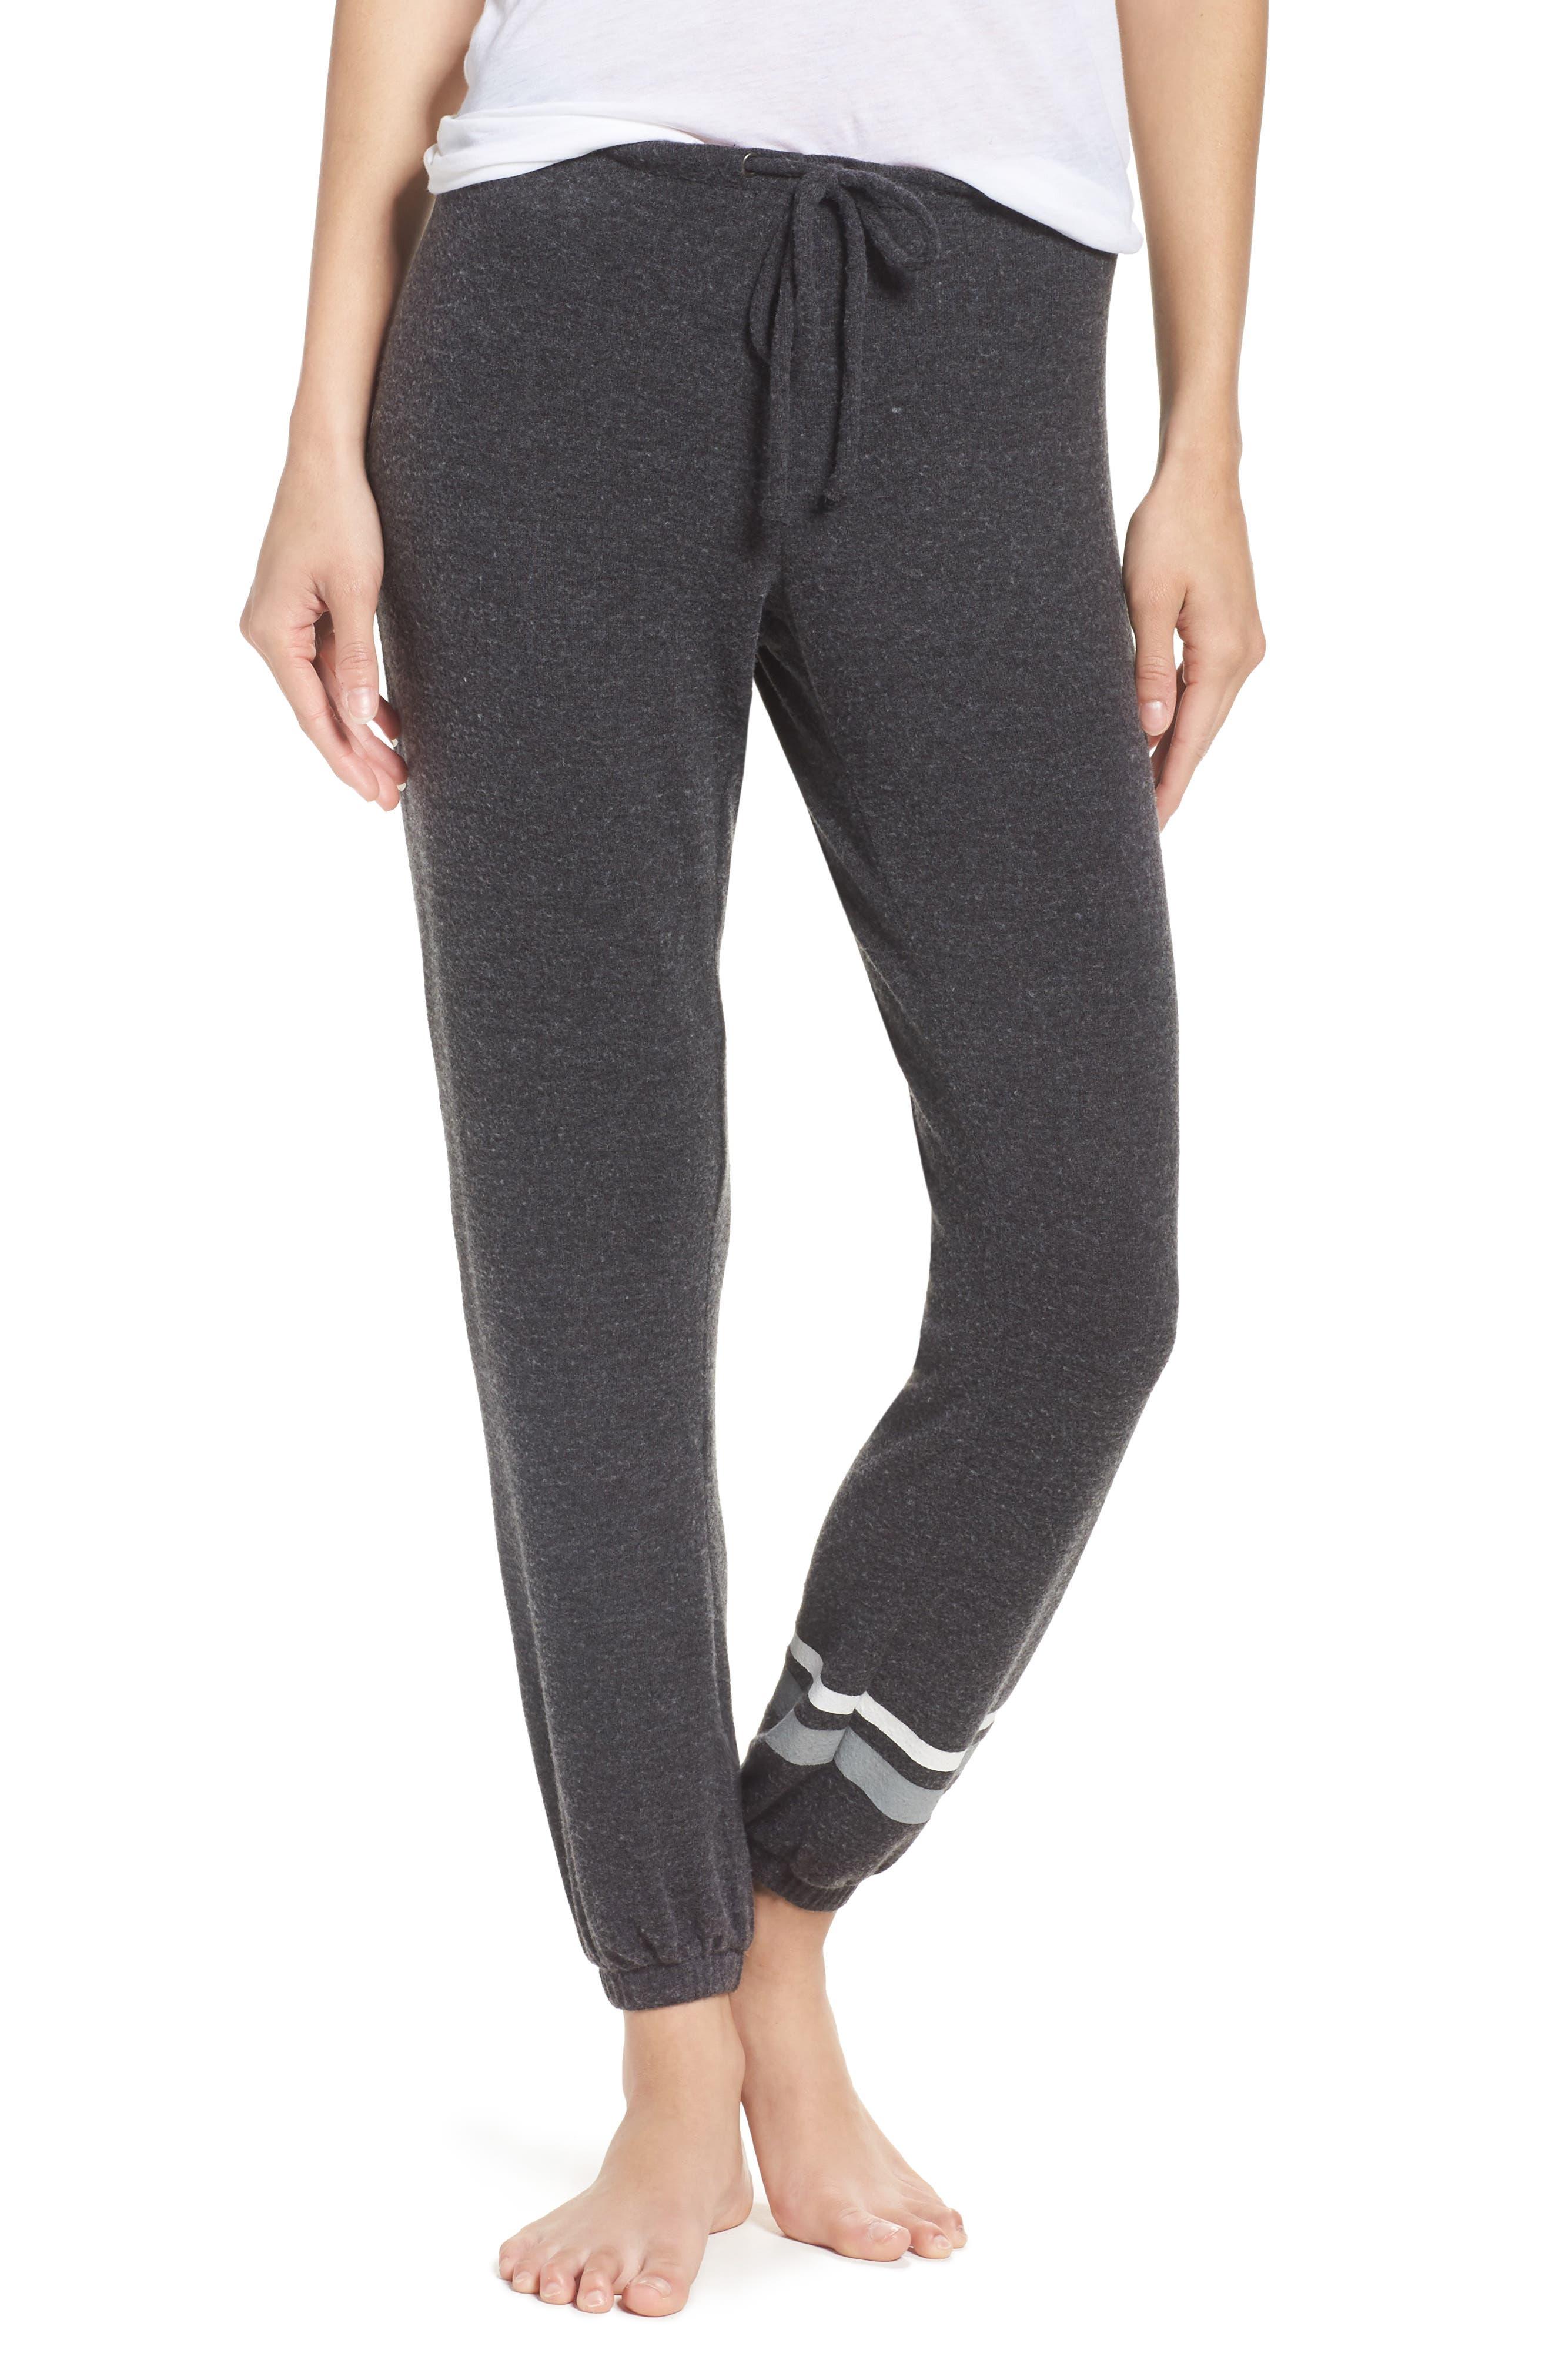 Love Lounge Jogger Pants,                         Main,                         color, Black